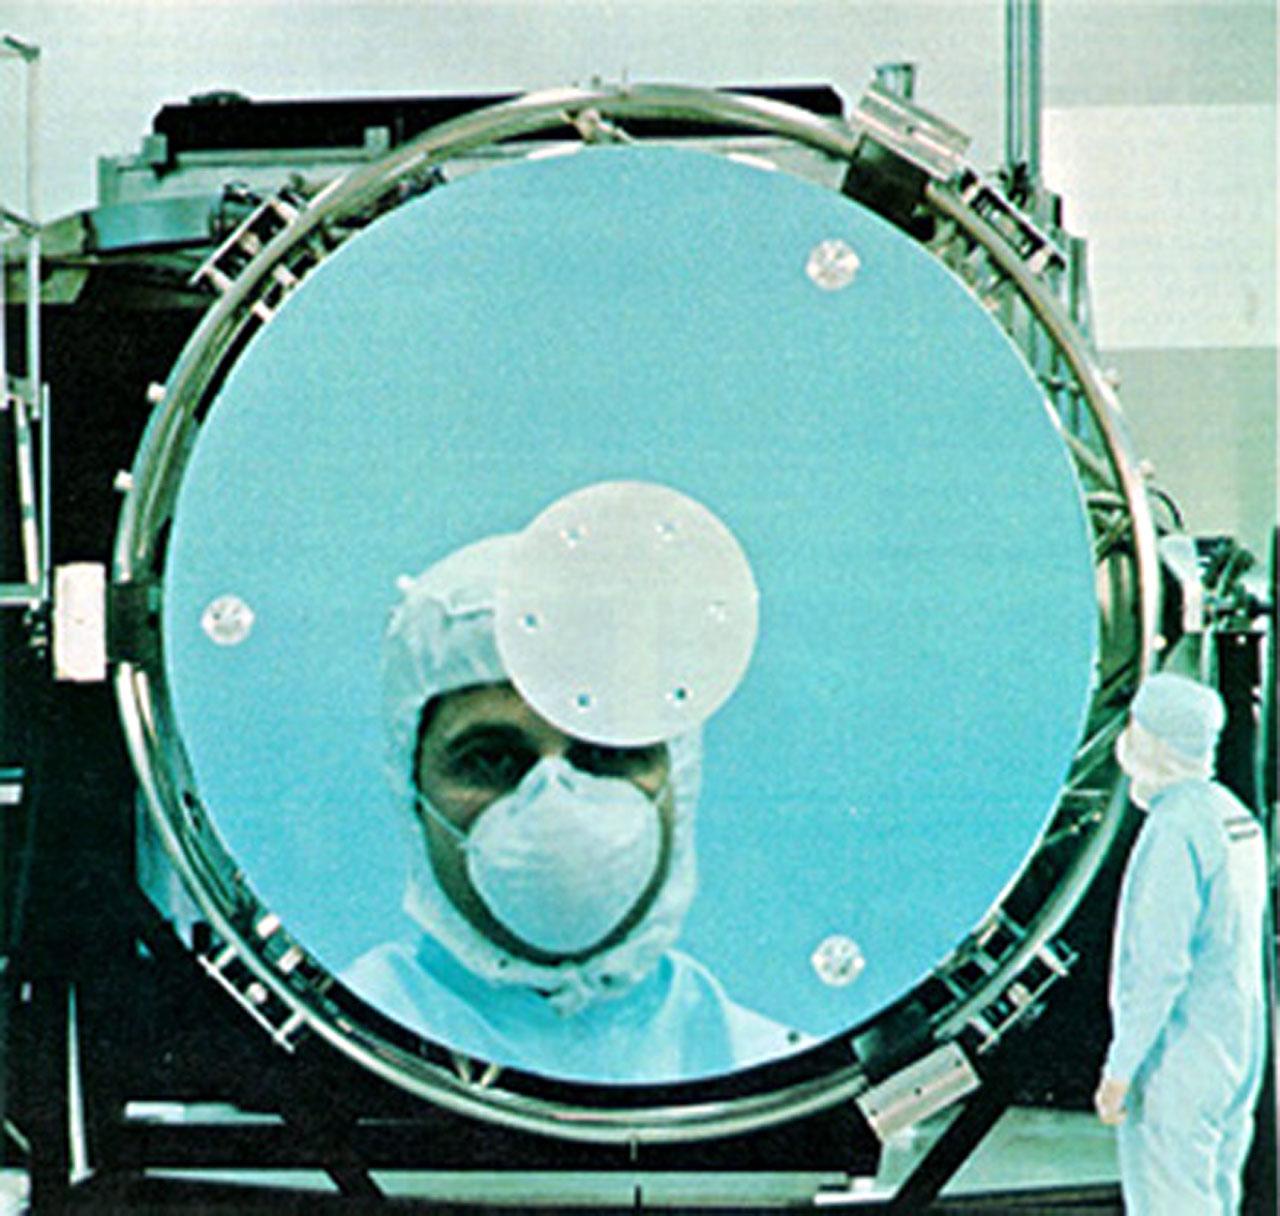 The Hubble Space Telescope mirror